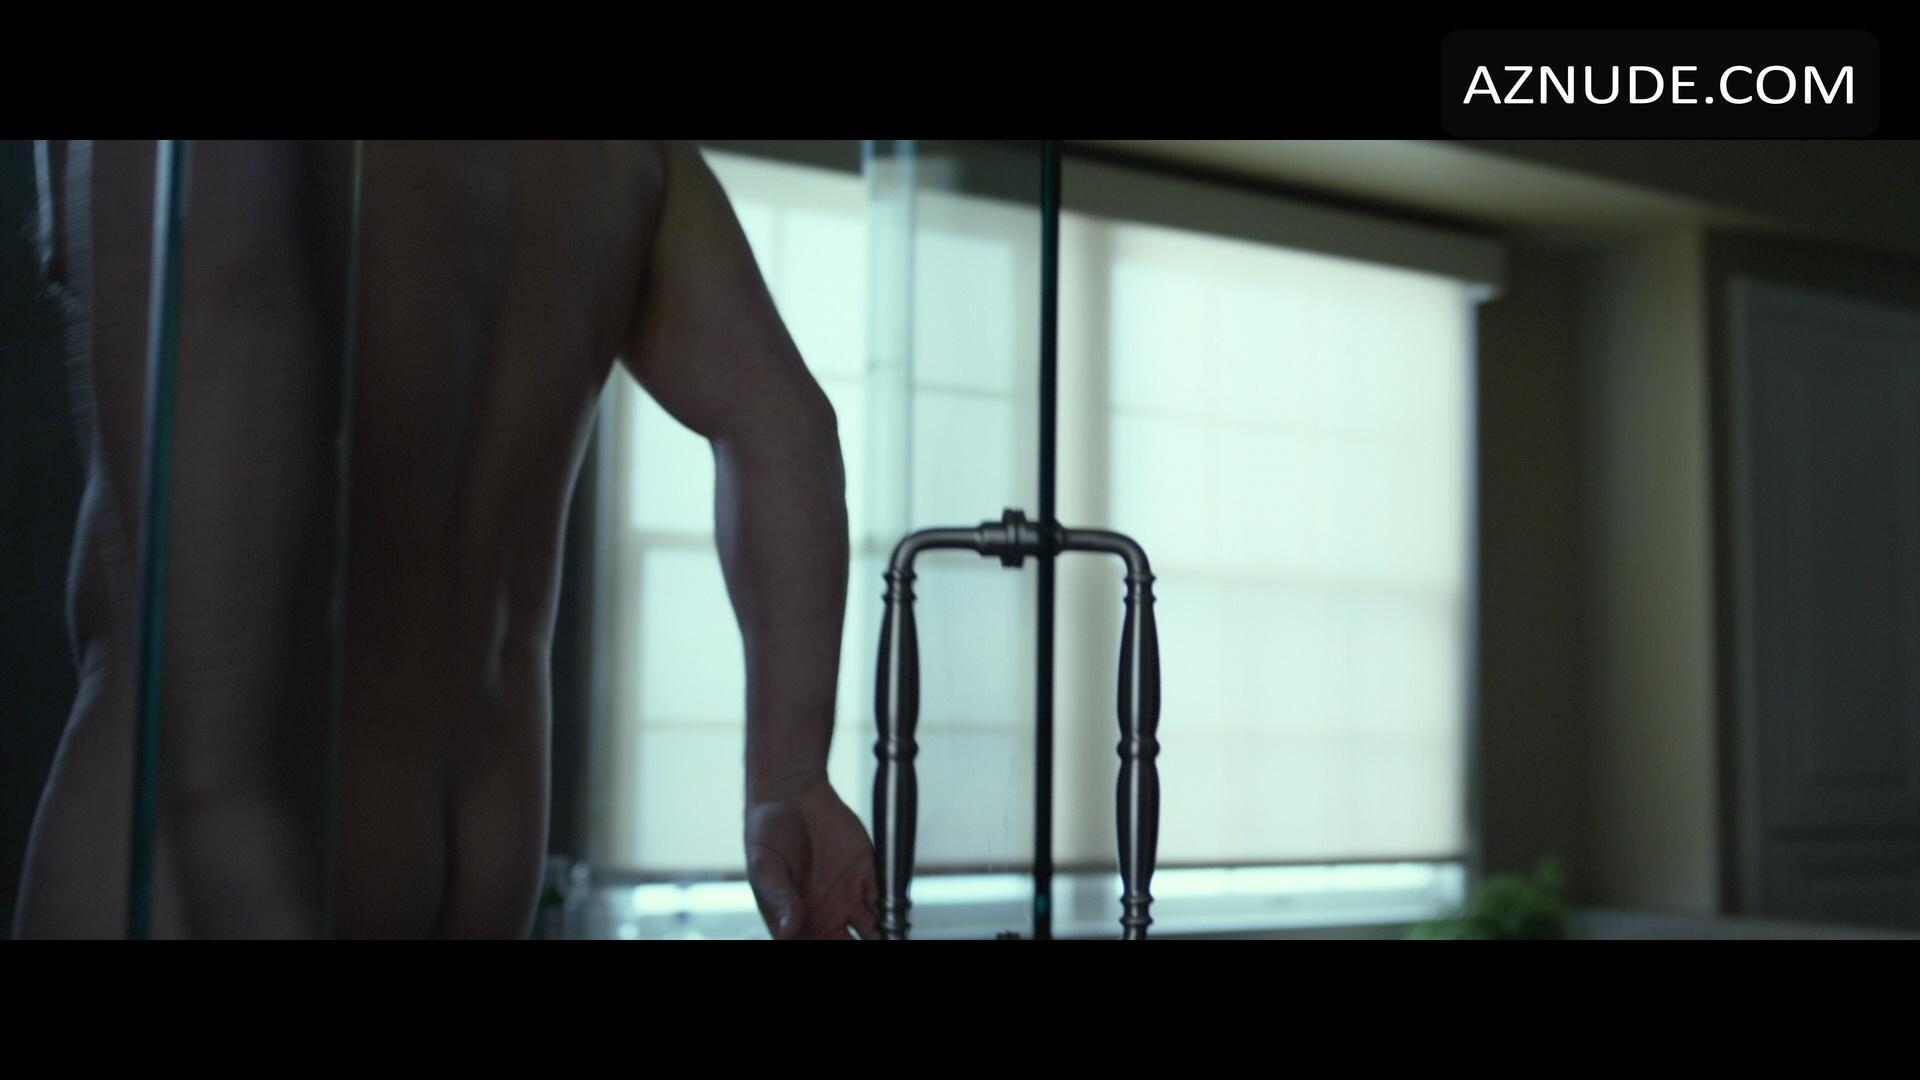 gone girl nude scenes aznude men